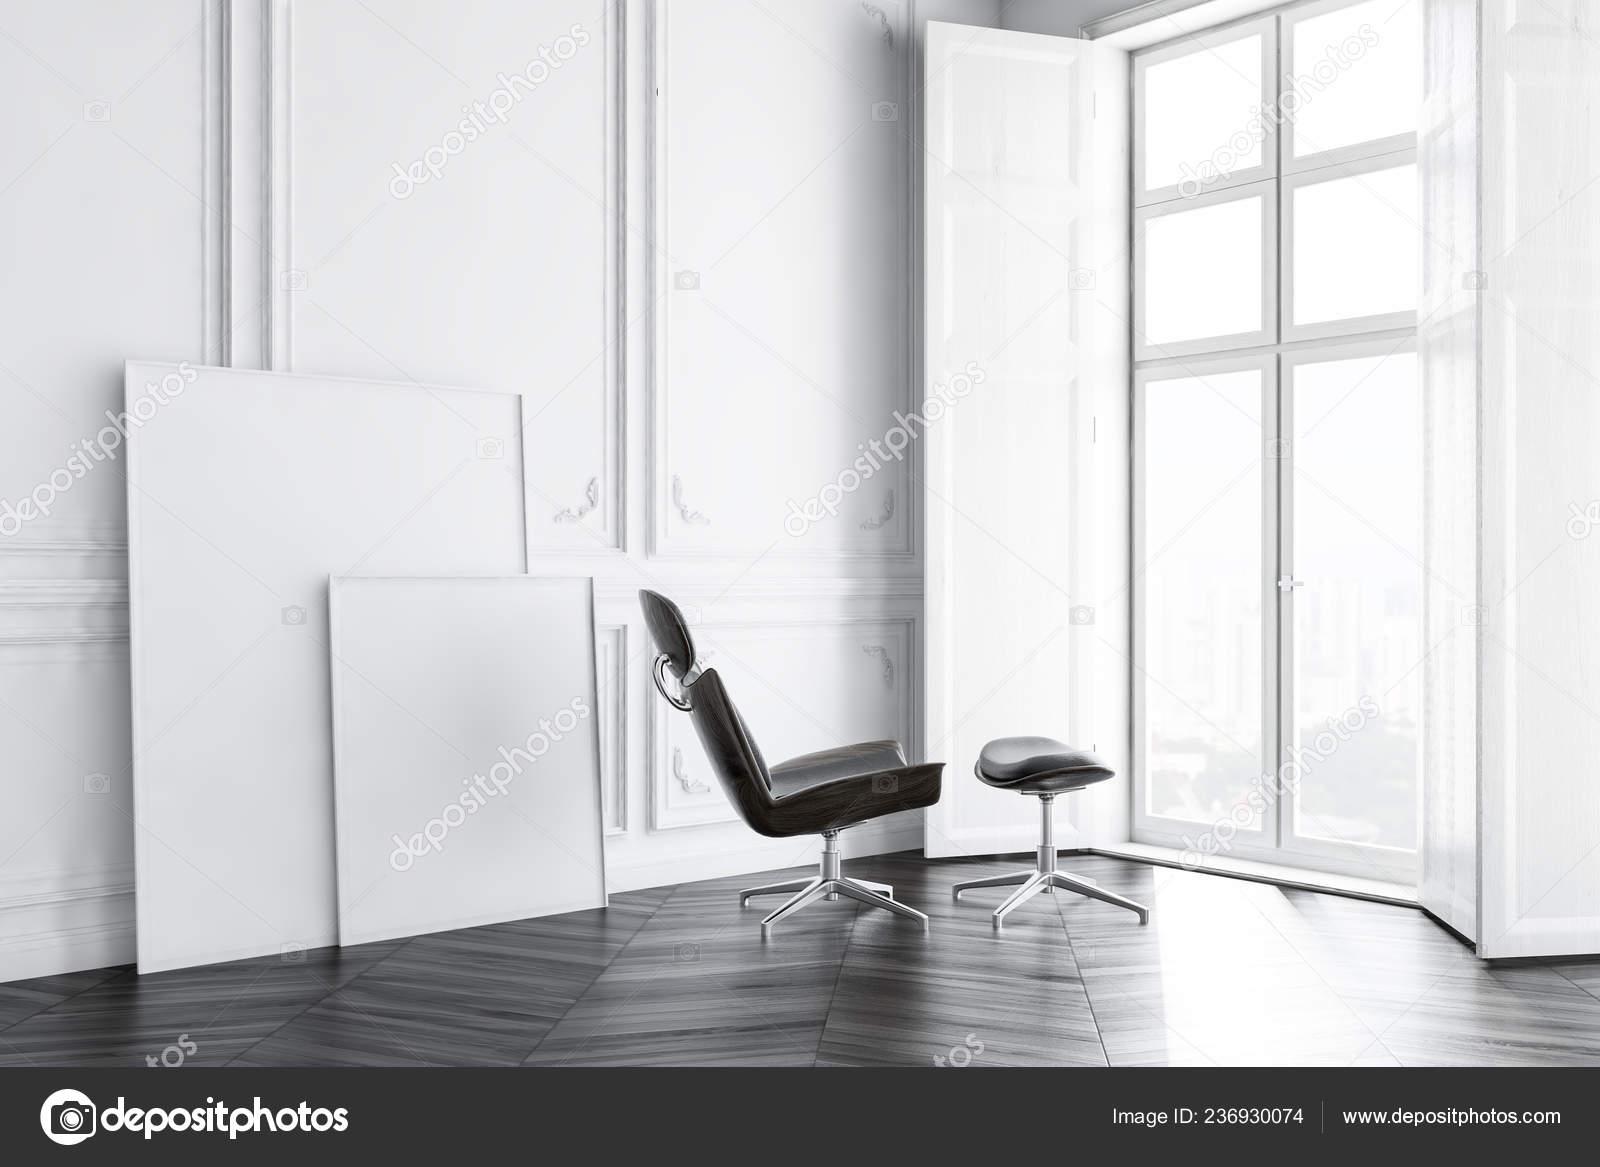 Corner Minimalistic Living Room White Walls Dark Wooden